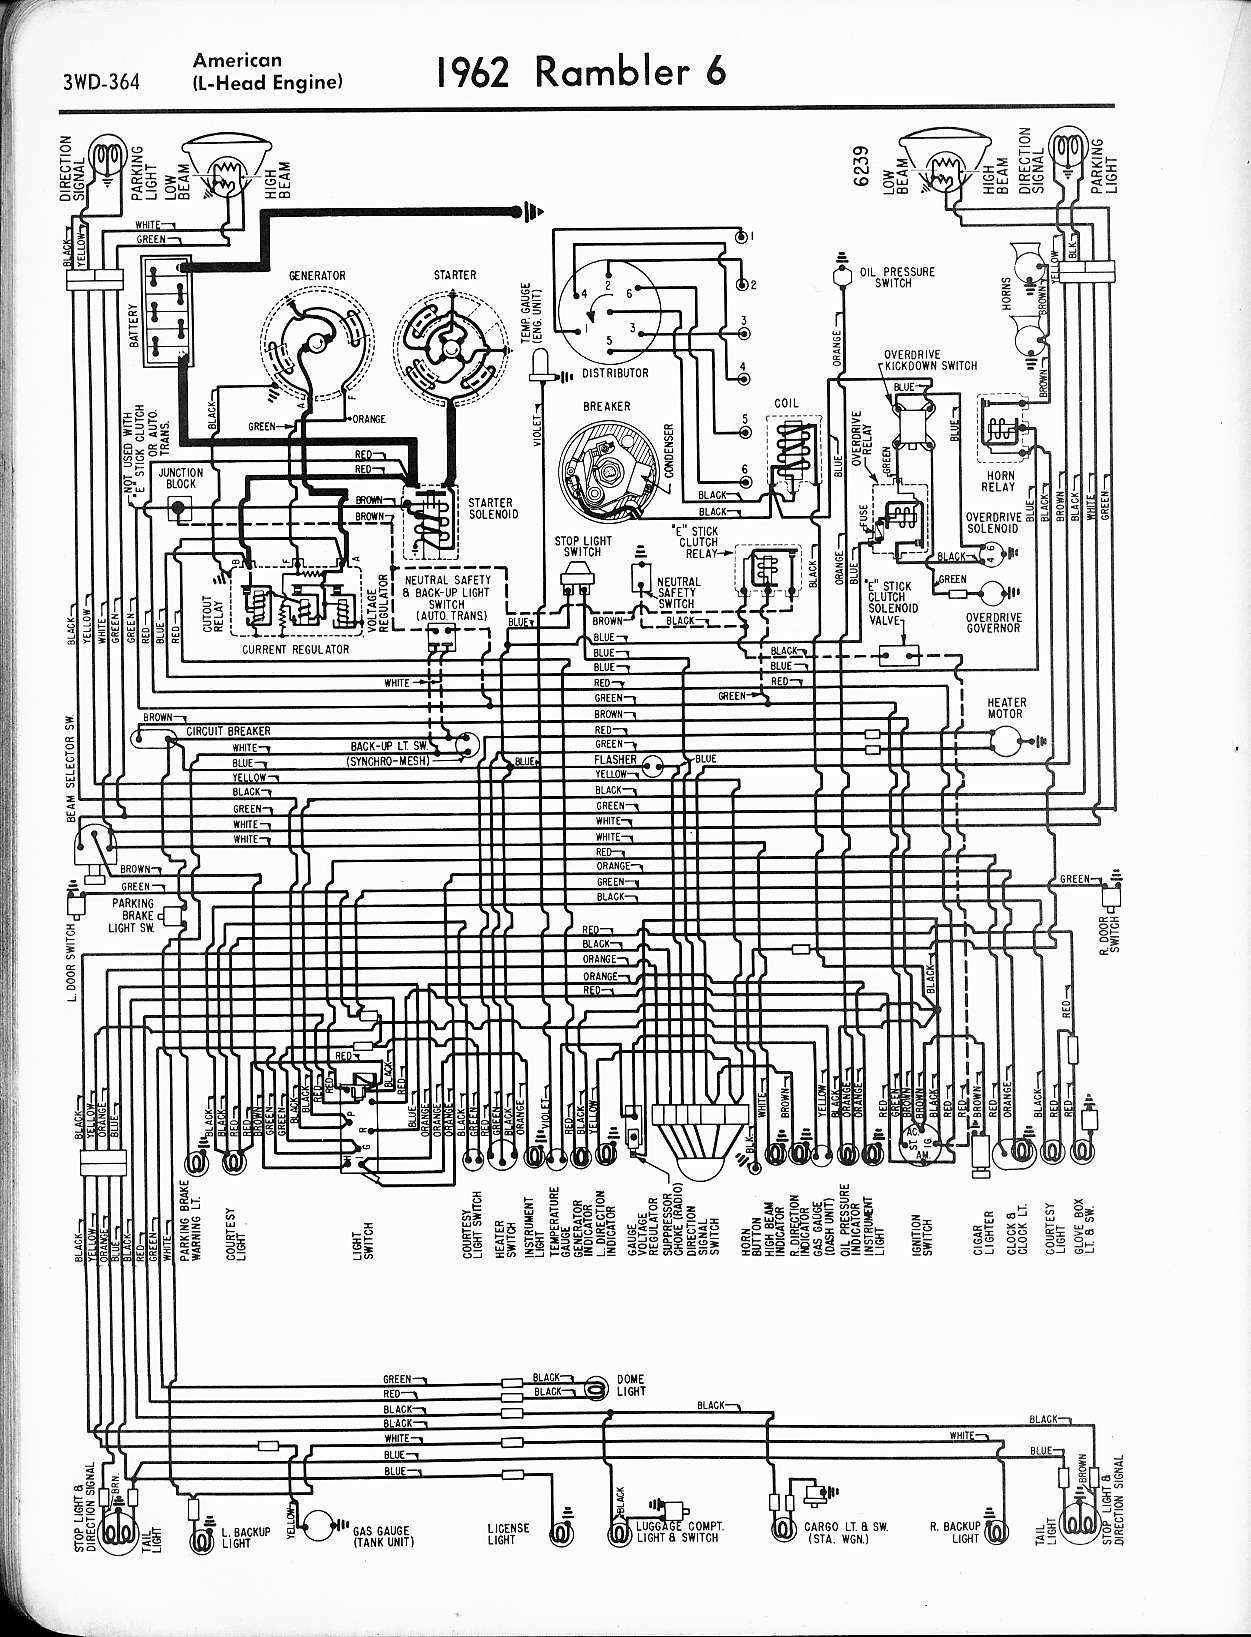 Amc Alternator Wiring - Zapkrel Mohammedshrine Wiring Database on amx parts, amx speedometer, amx headlight, amx engine,